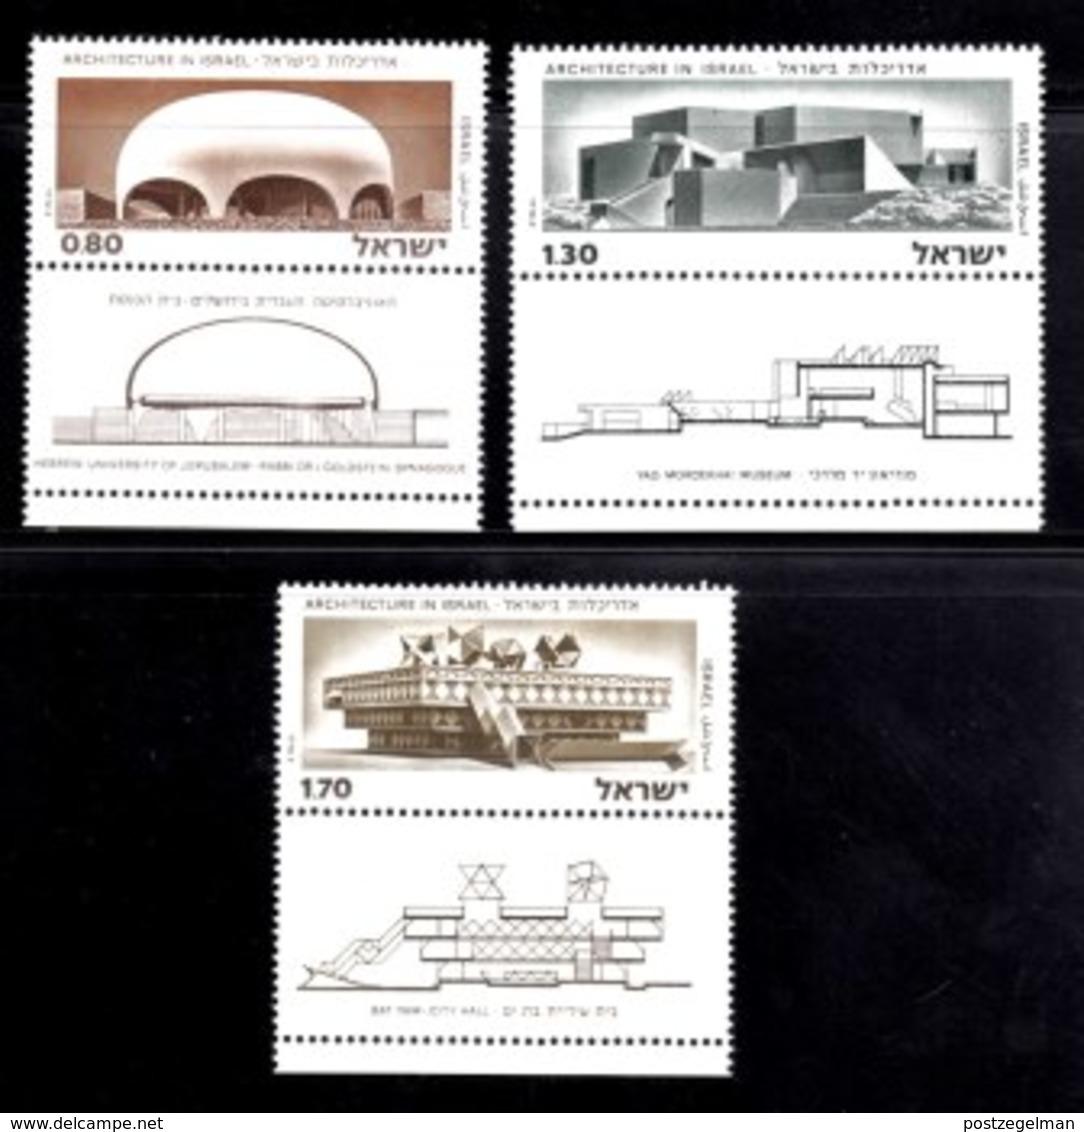 ISRAEL, 1975, Unused Hinged Stamp(s),  With Tab, Rchitecture In Israel, SG Number 596-598, Scan Number 17448 - Israel